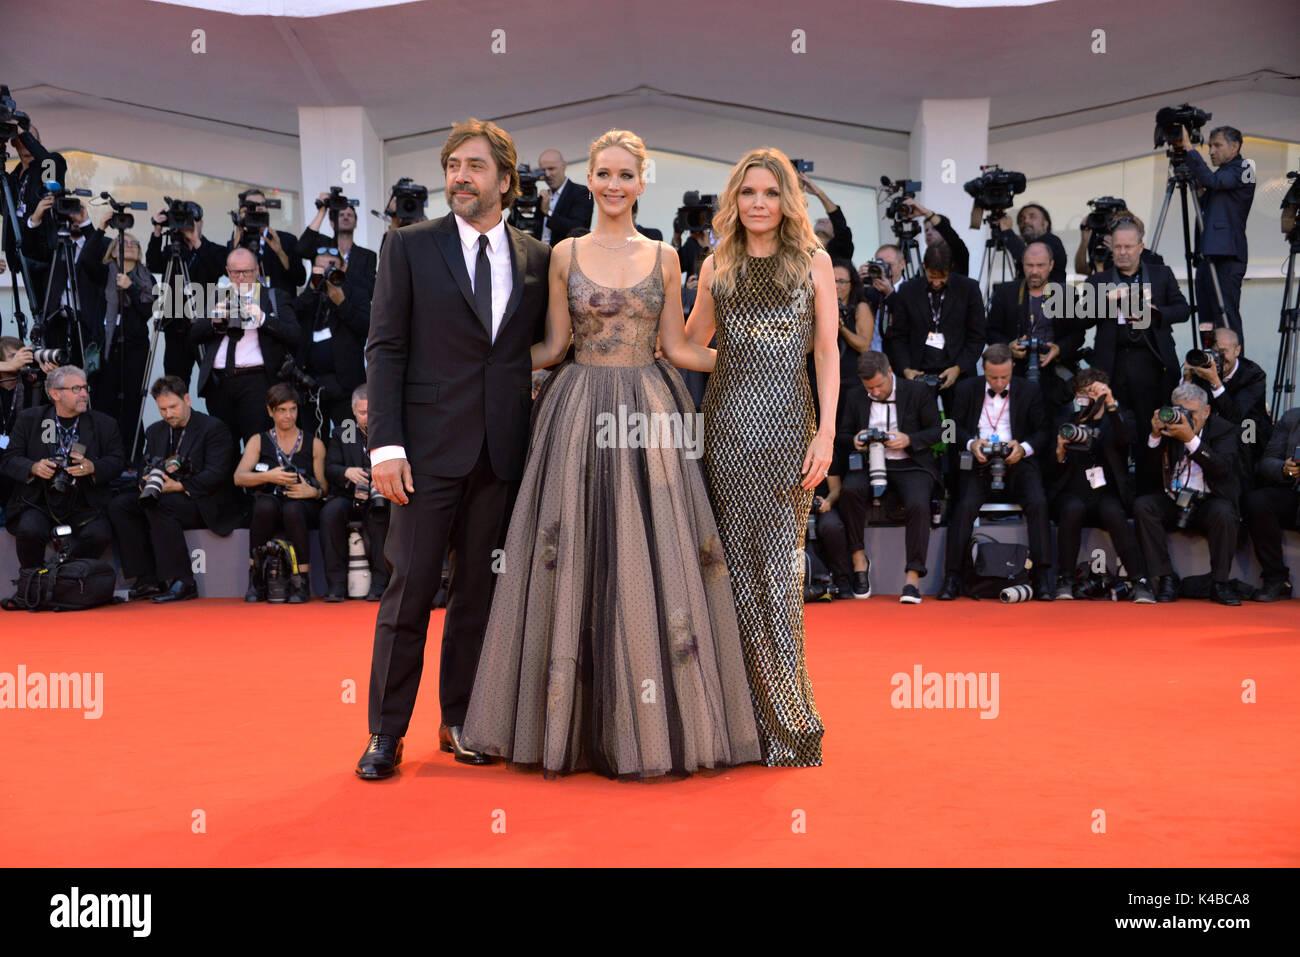 Venice, Italy. 5th September, 2017. L-R: Spanish actor Javier Bardem, Usa actress Jennifer Lawrence and Usa actress Stock Photo